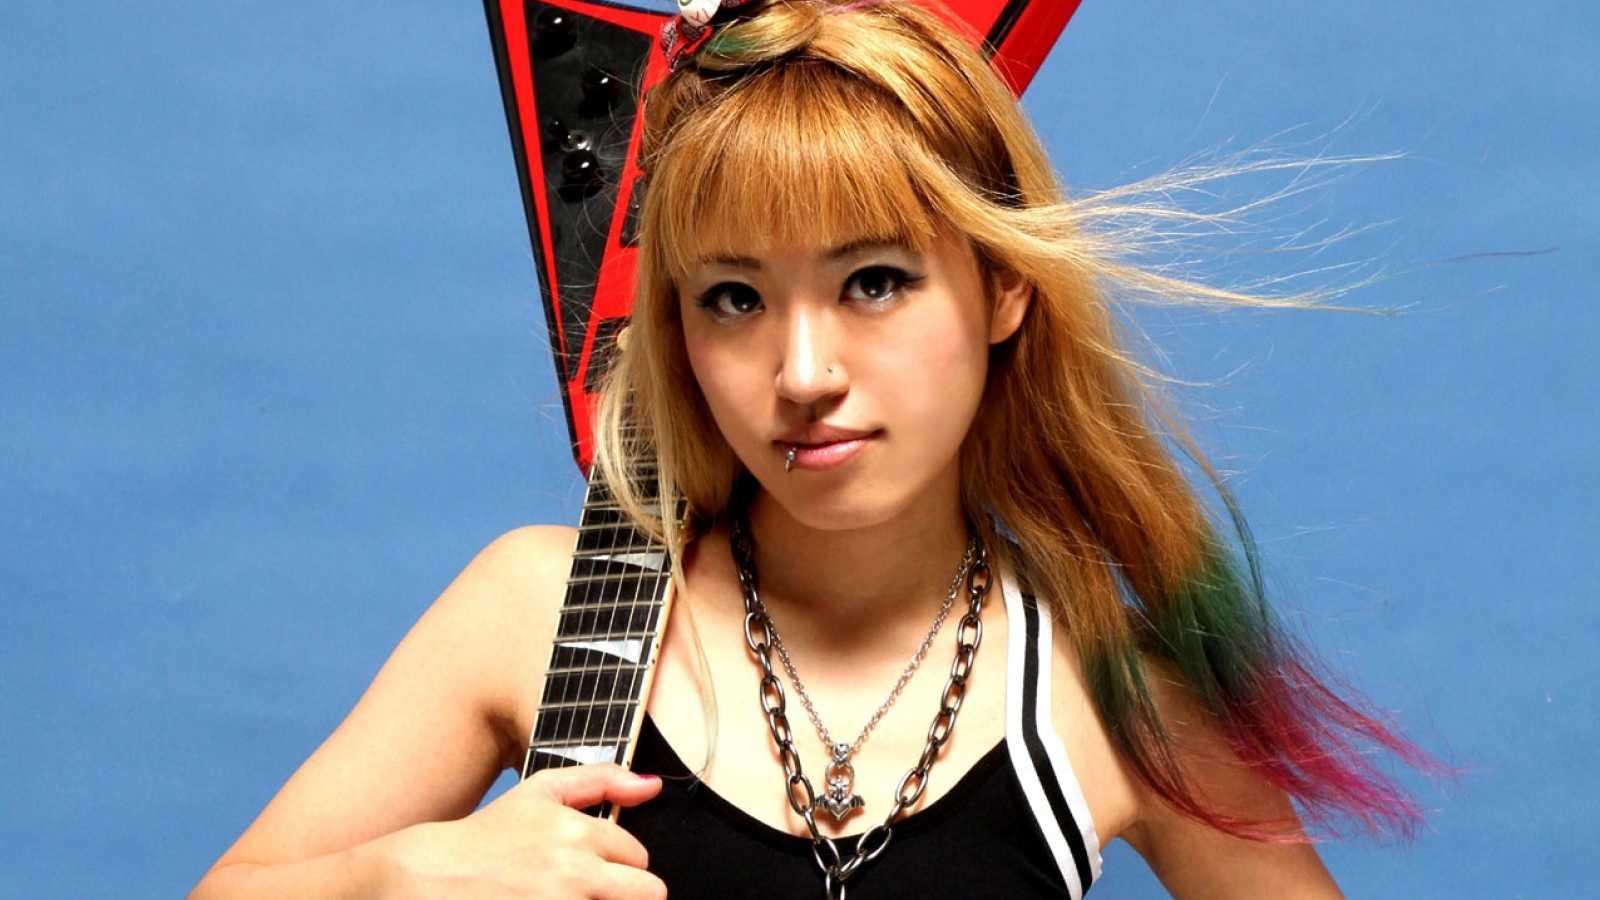 Rie a.k.a. Suzaku © Poppin Records